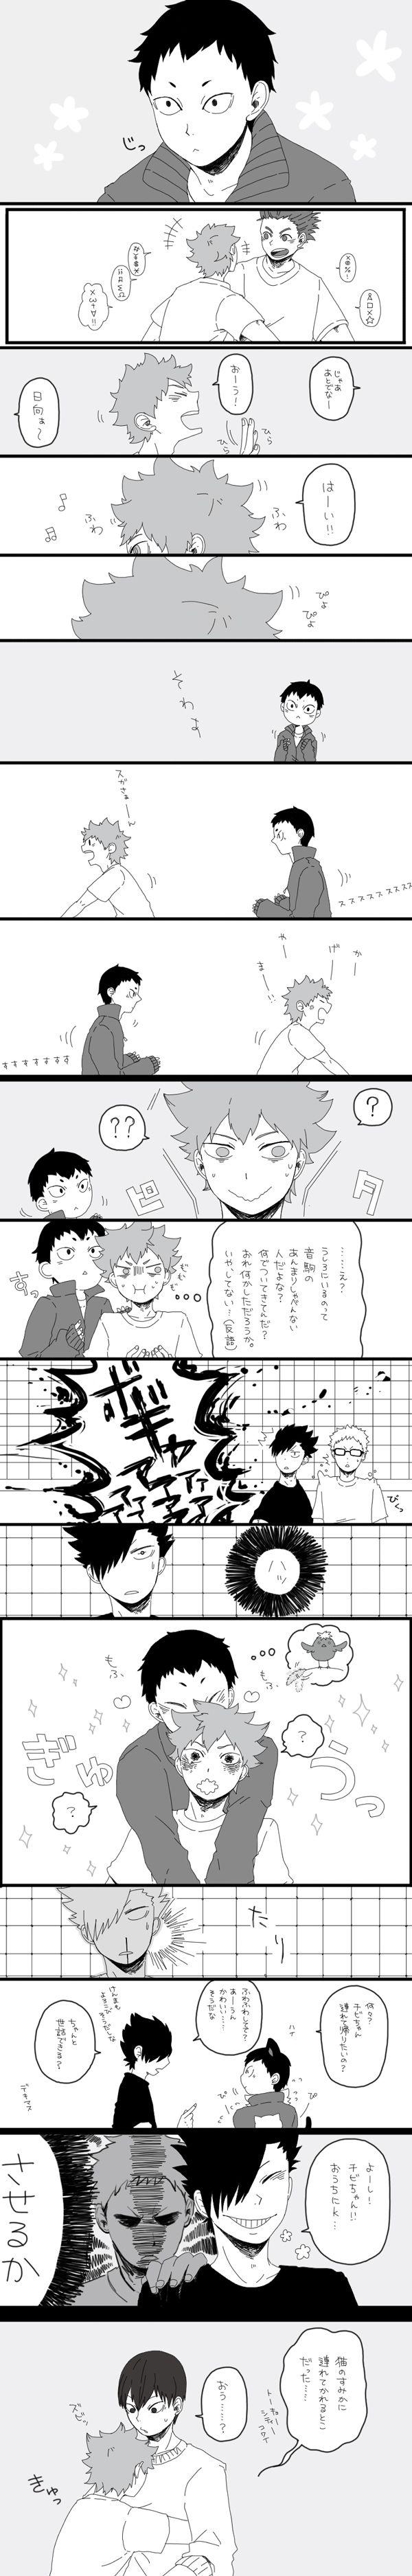 Haikyuu!! || why i don't know japanese T^T